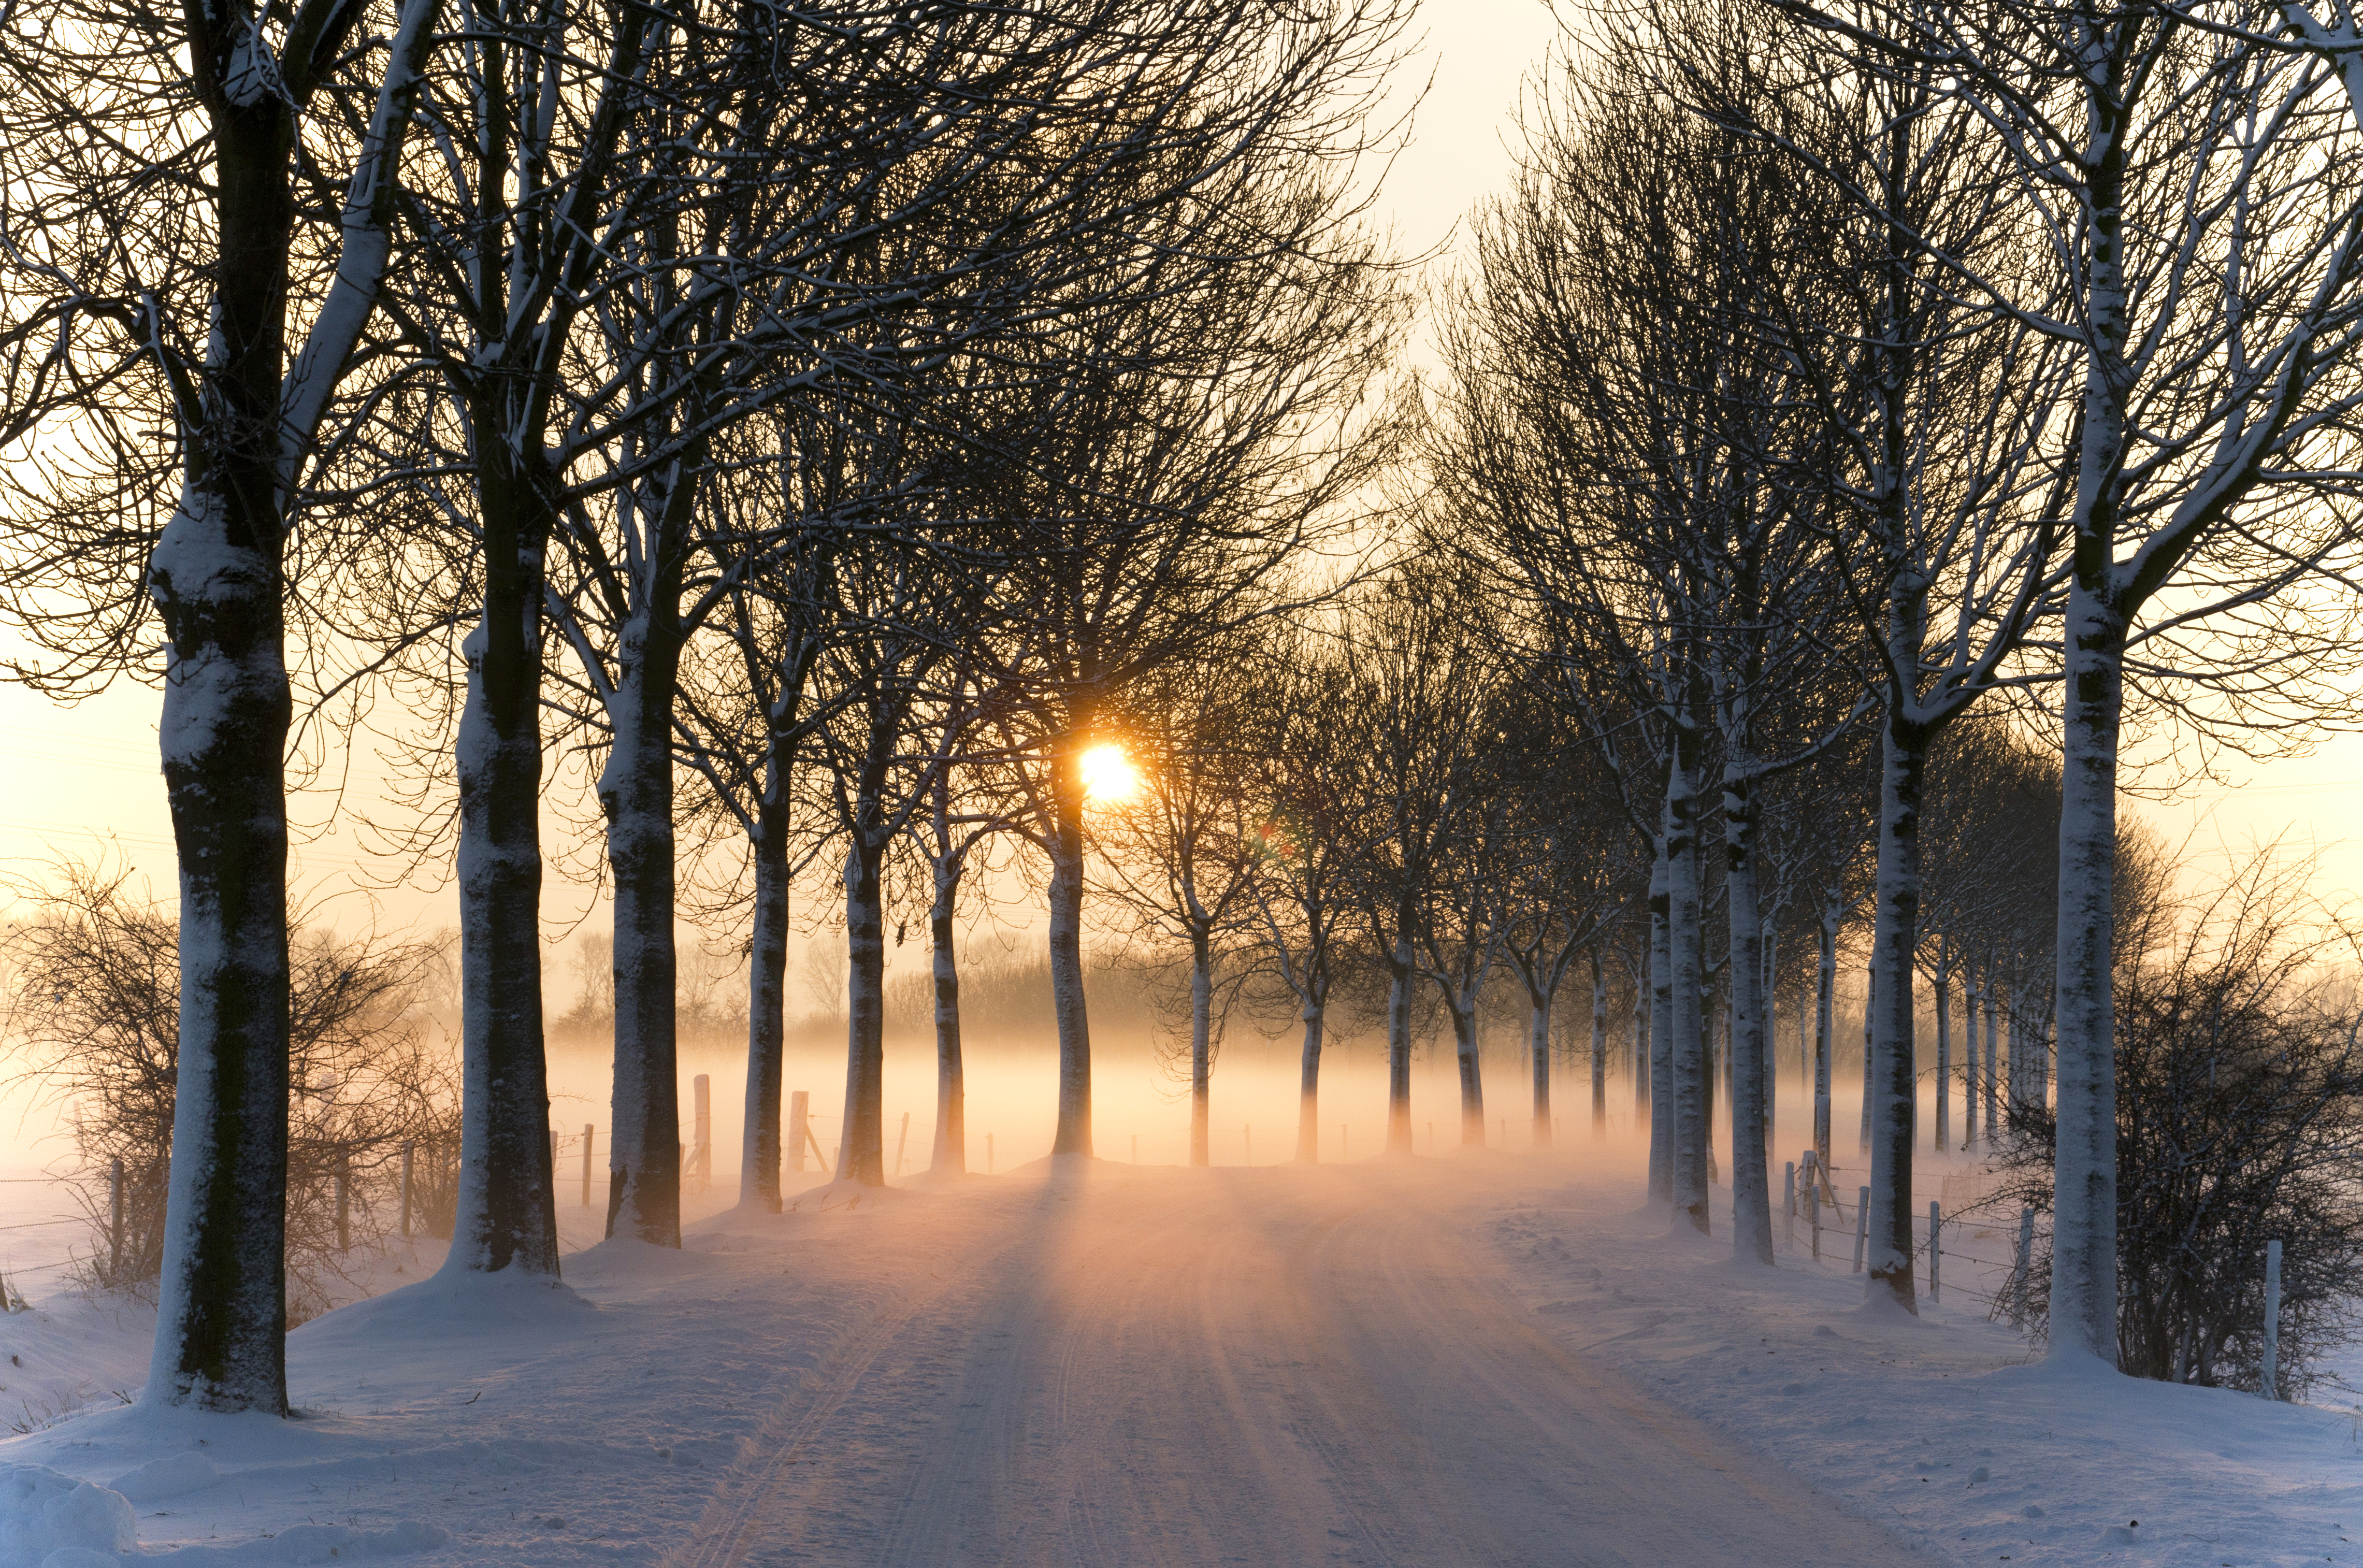 https://upload.wikimedia.org/wikipedia/commons/1/17/Misty_winter_afternoon_%285277611659%29.jpg